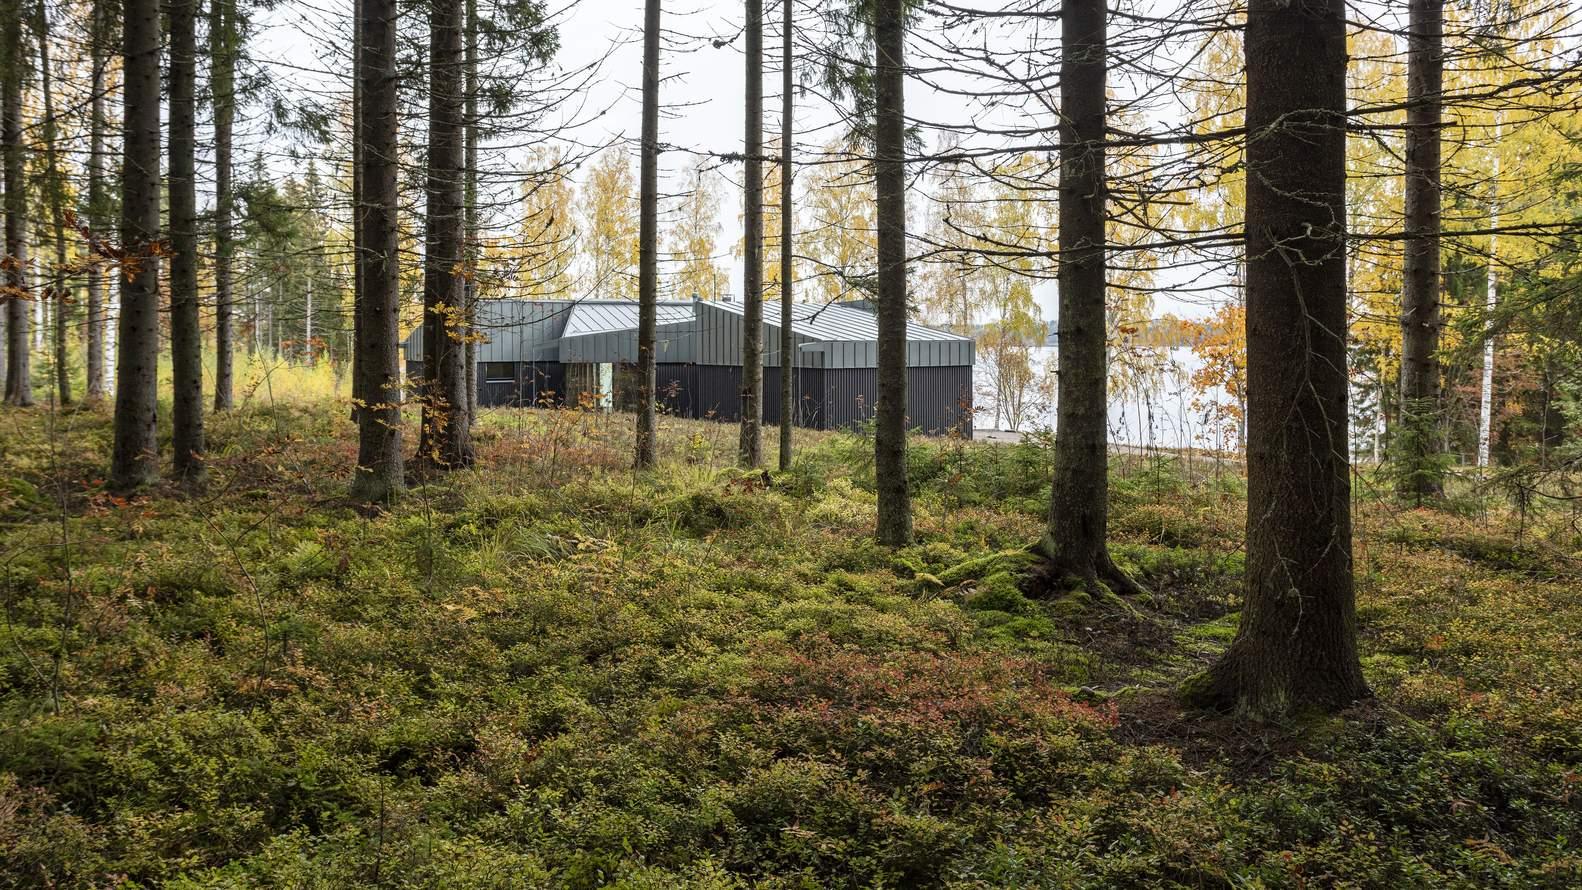 Яркий модернистский дом у лесного озера, Финляндия